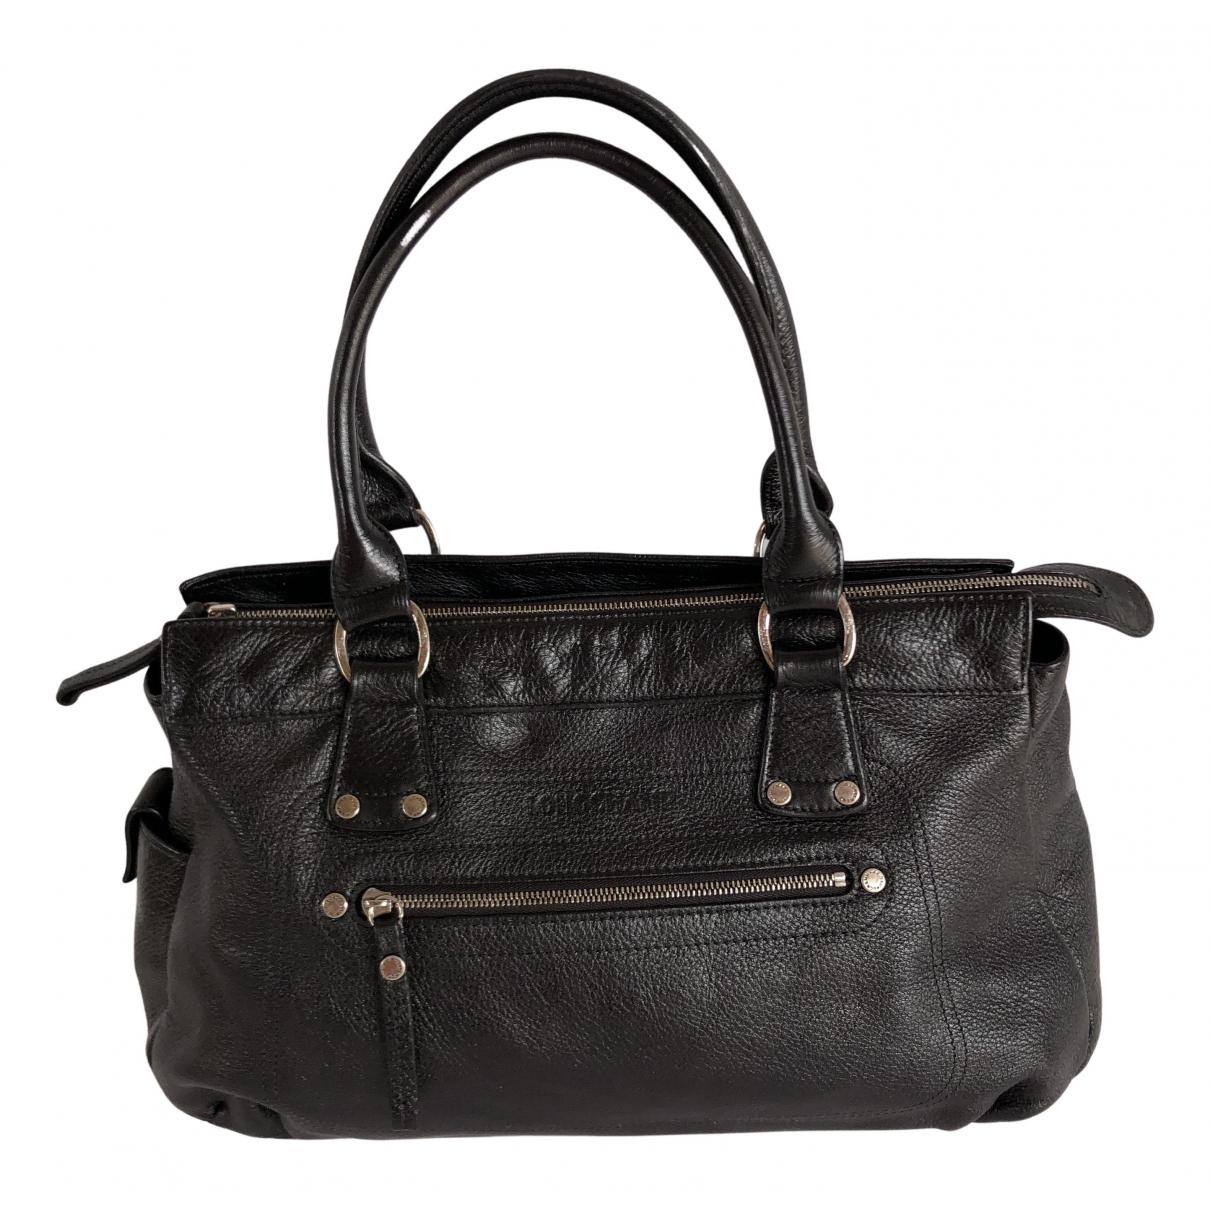 Longchamp - Sac a main Balzane pour femme en cuir - marron